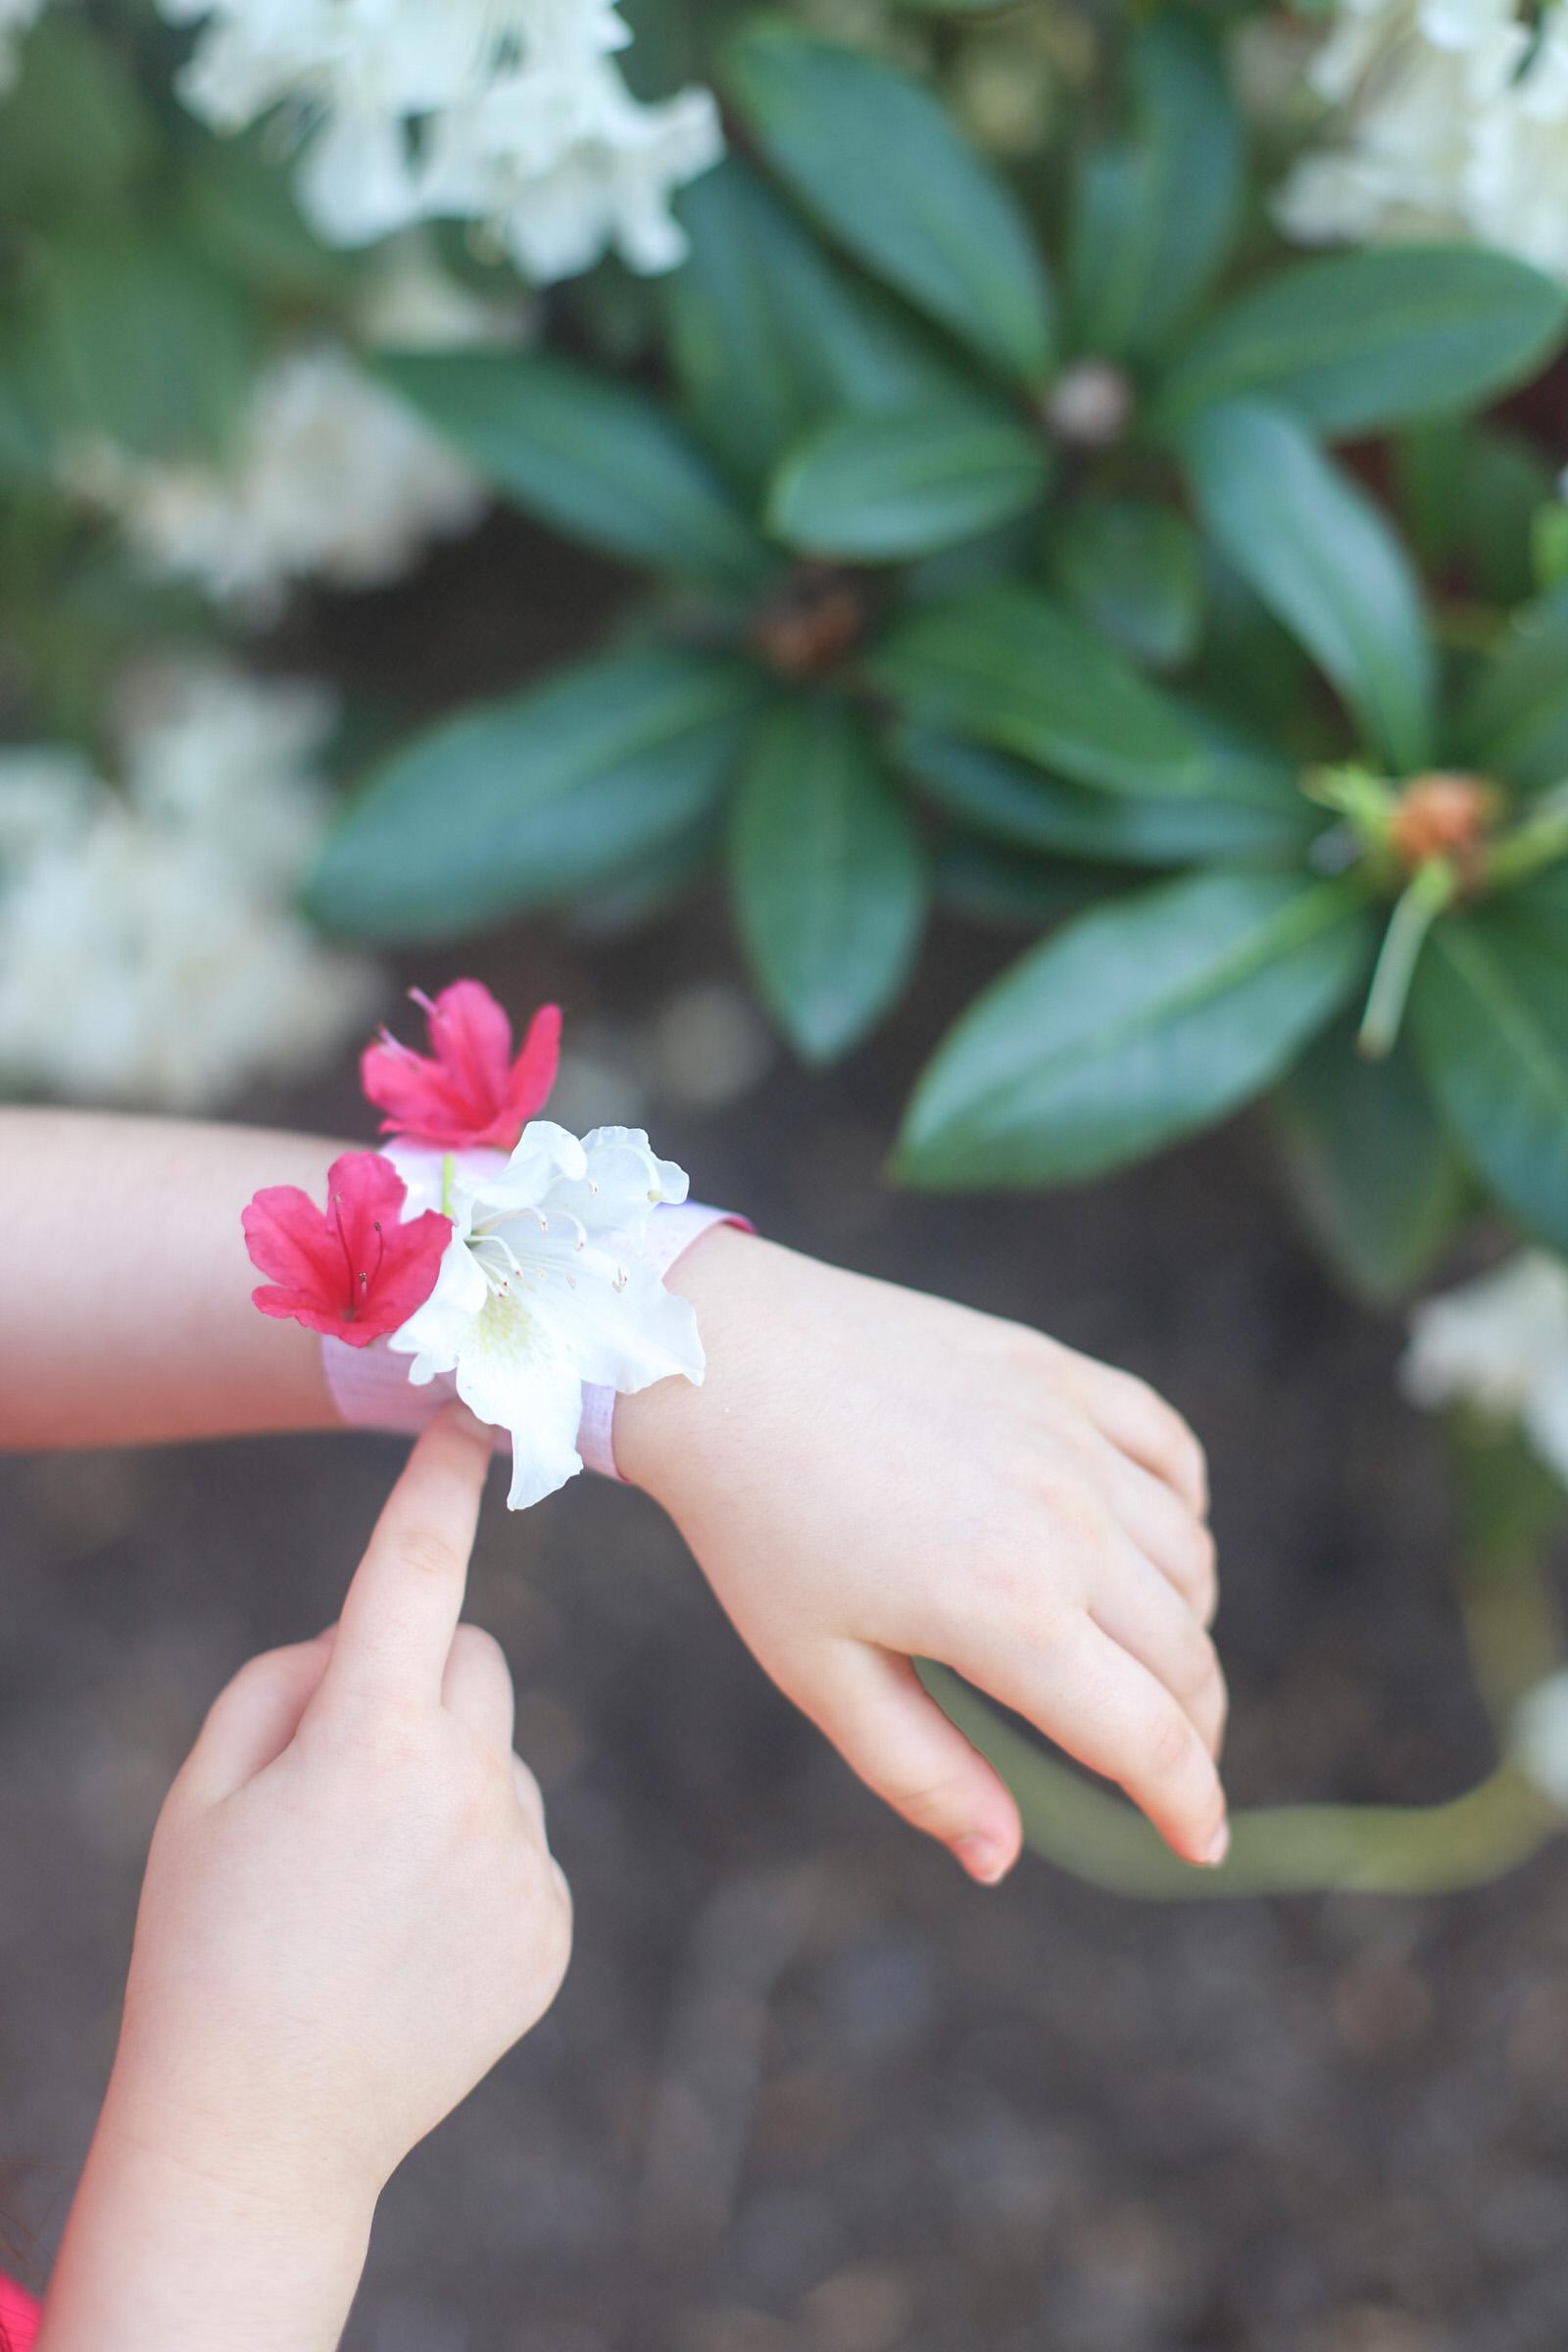 Nature Walk Kids Flower Bracelet DIY Activity